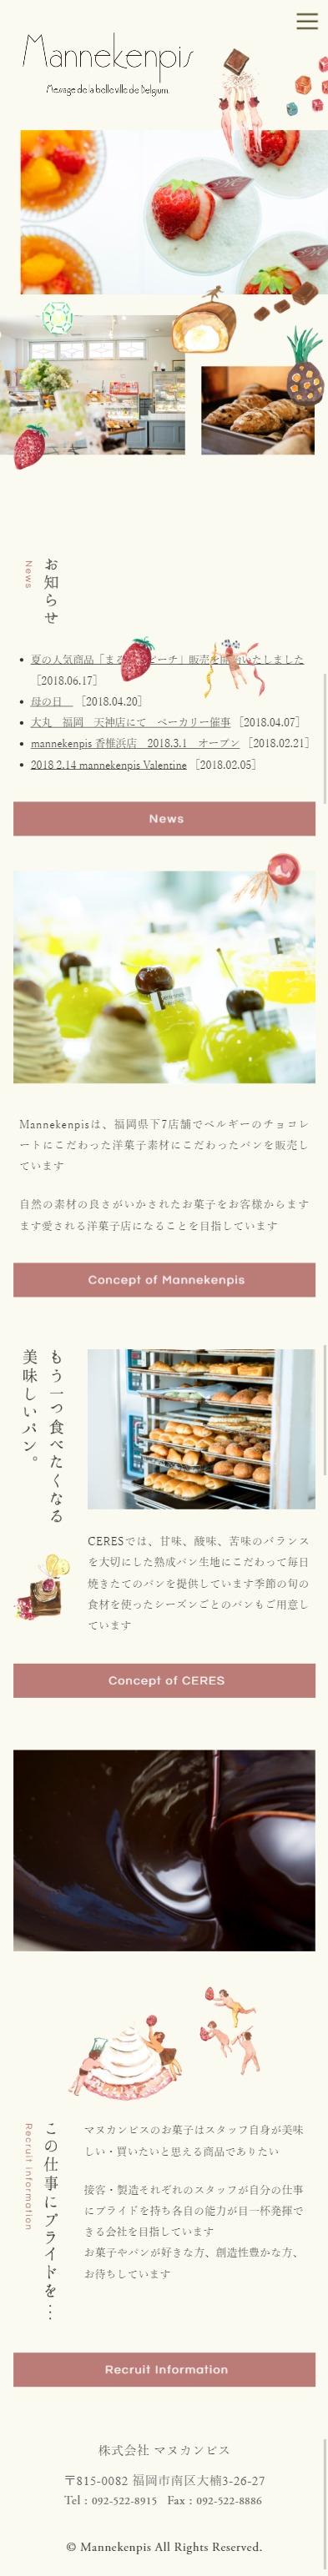 Manneknepis | マヌカンピススマホ版イメージ